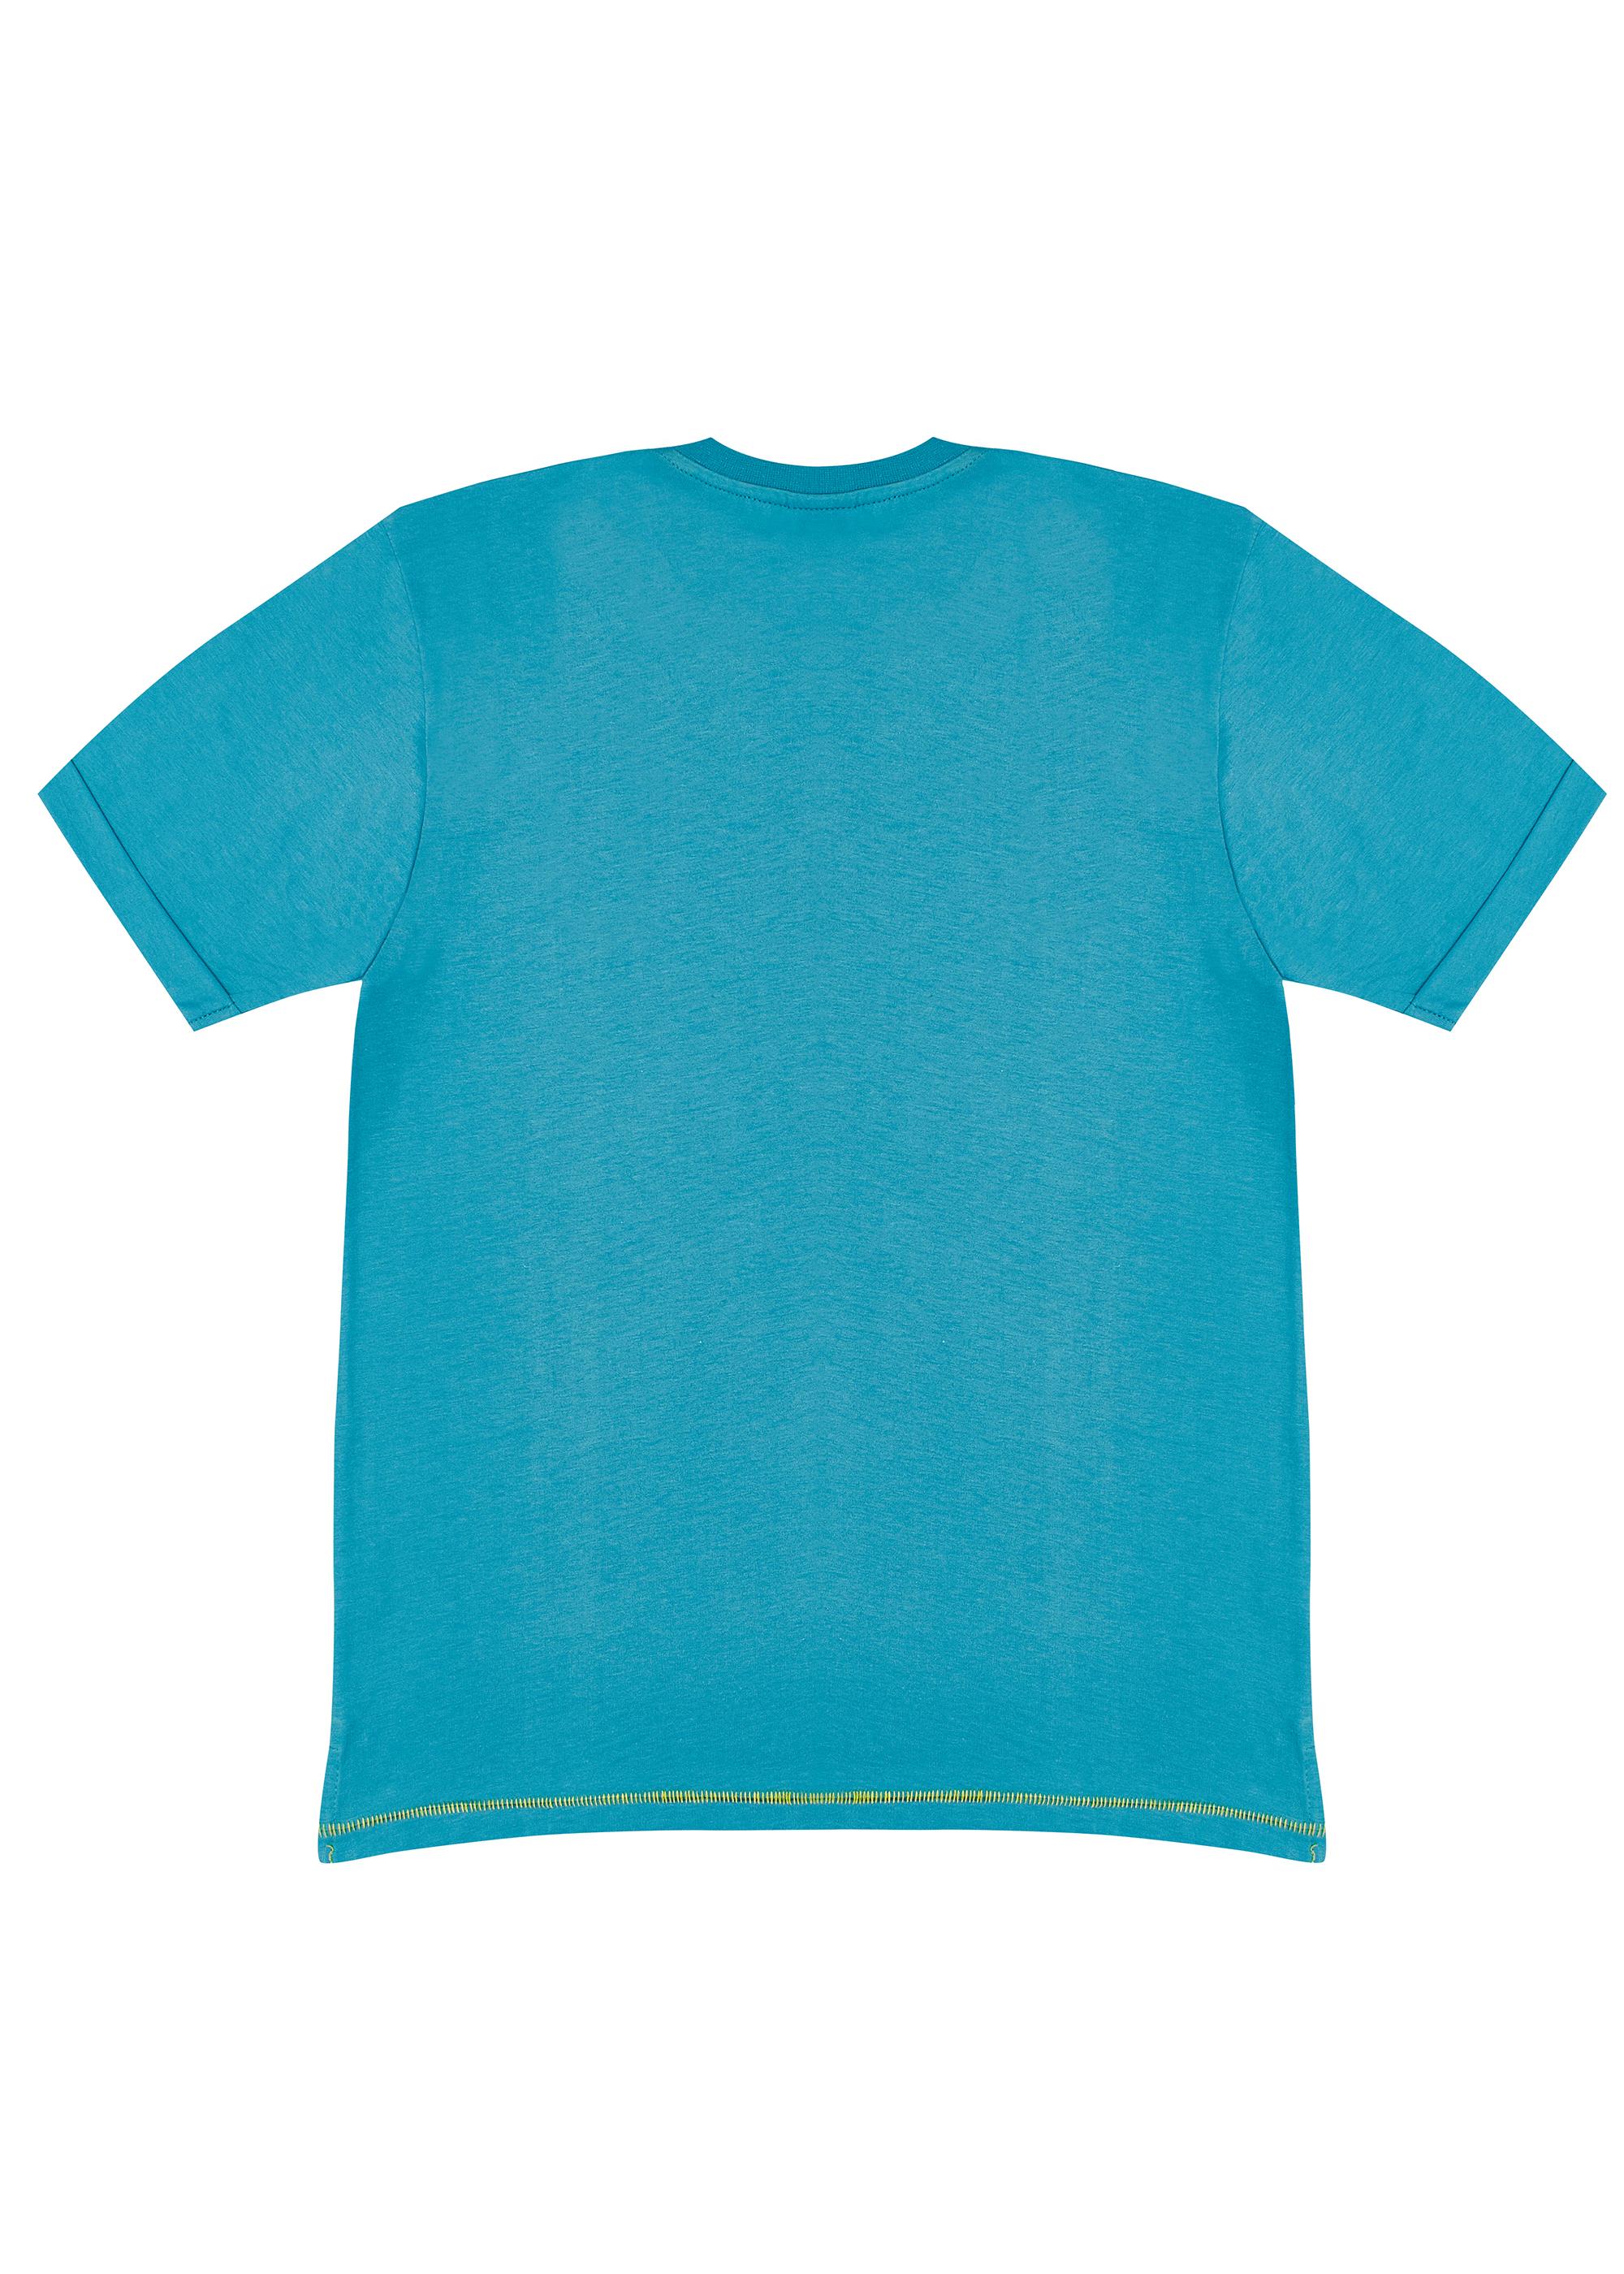 Chlapecké tričko Play to Win Modrá